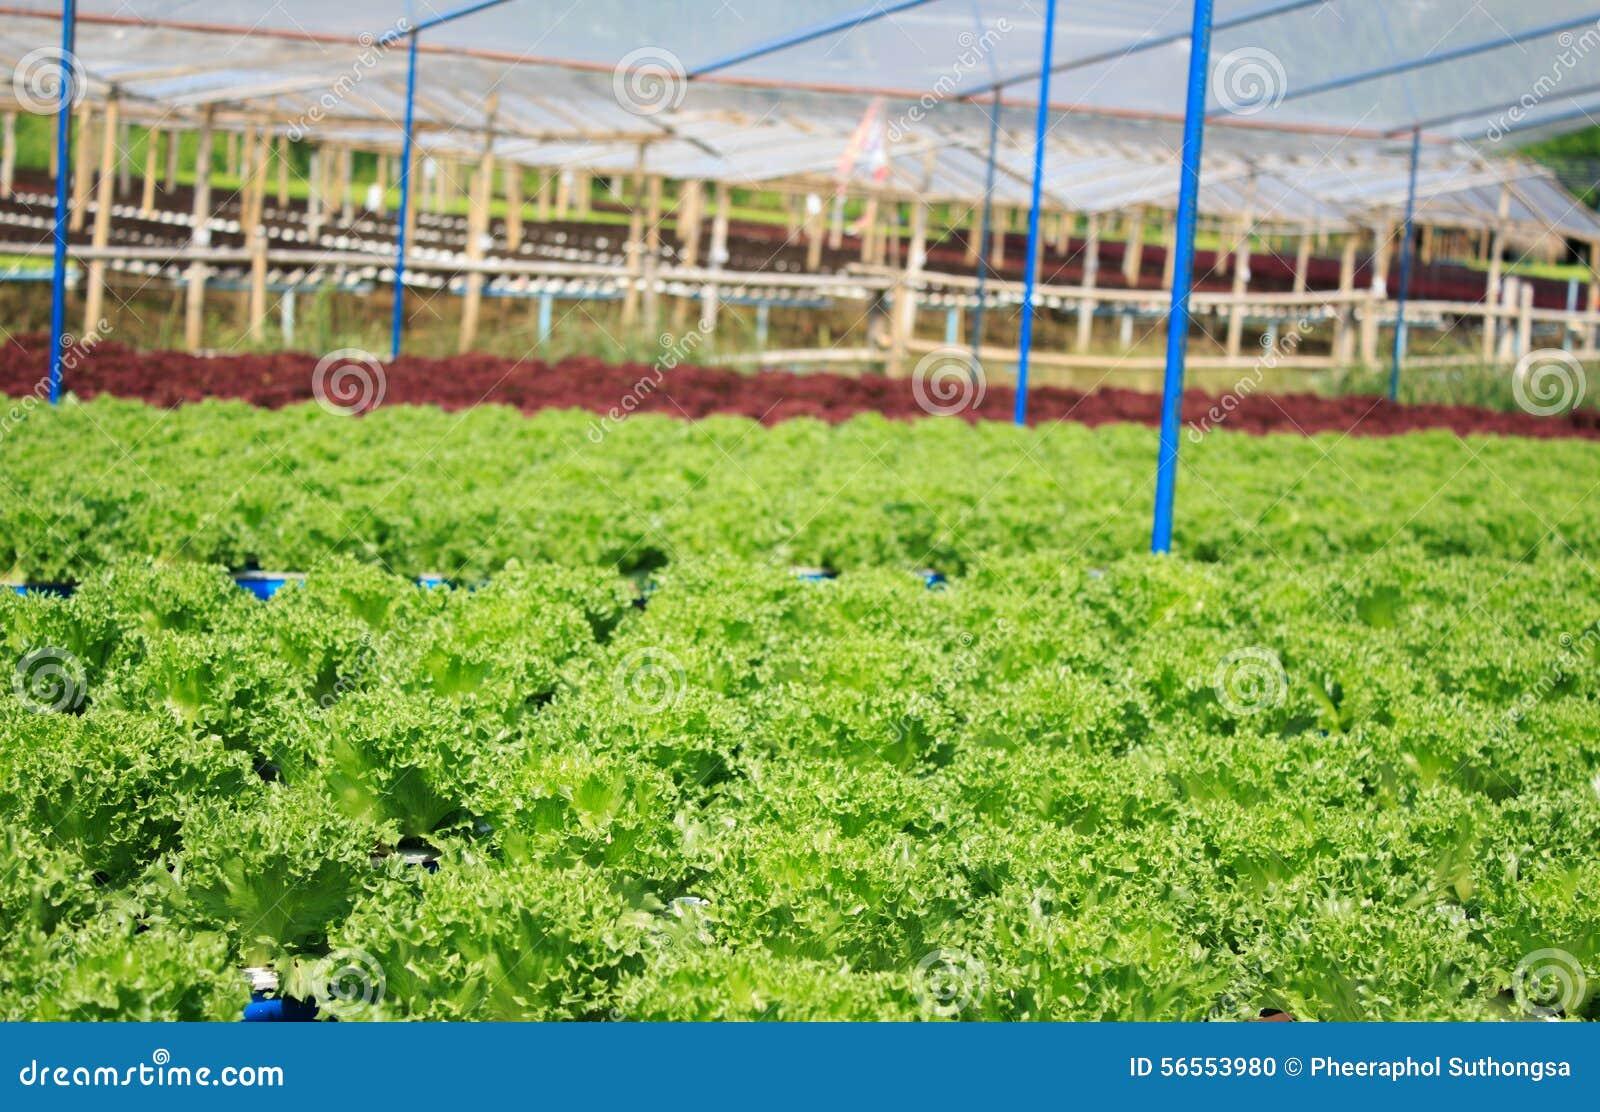 Download Υδροπονικό φυτικό αγρόκτημα Στοκ Εικόνες - εικόνα από highlands, σύγχρονος: 56553980